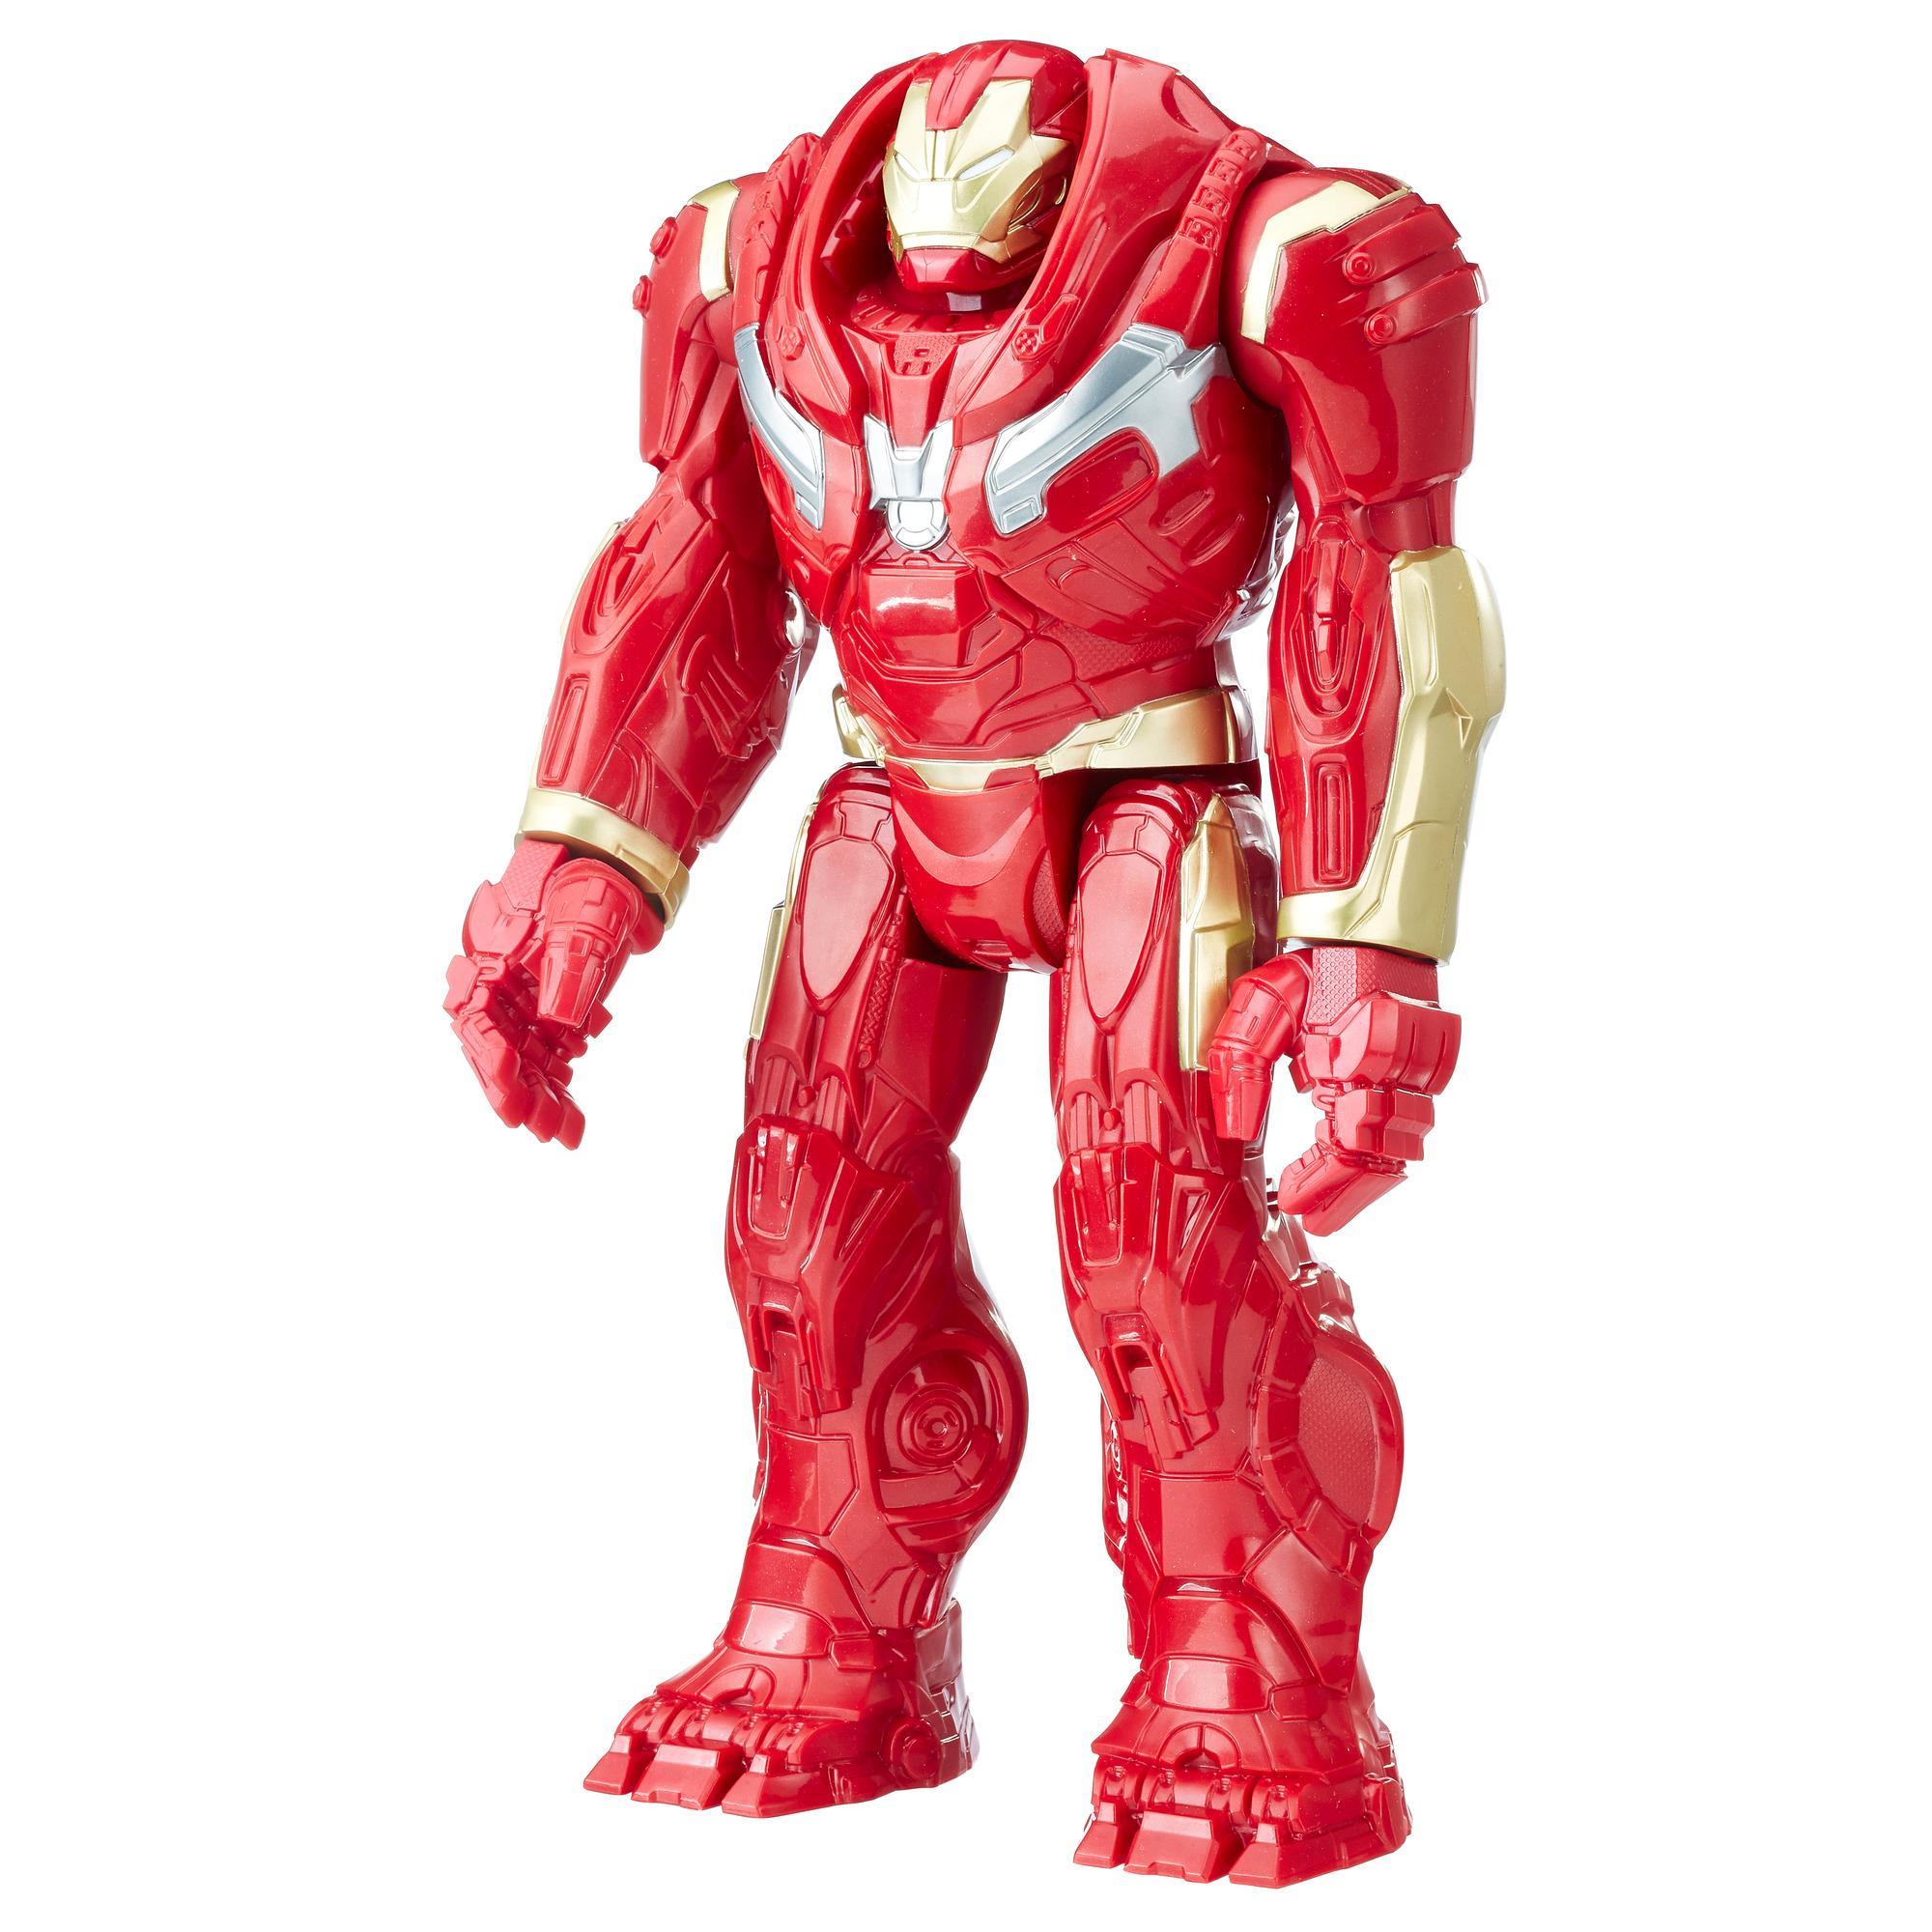 Marvel Infinity War Titan Hero Series - Hulkbuster con puerto para Titan Hero Power FX